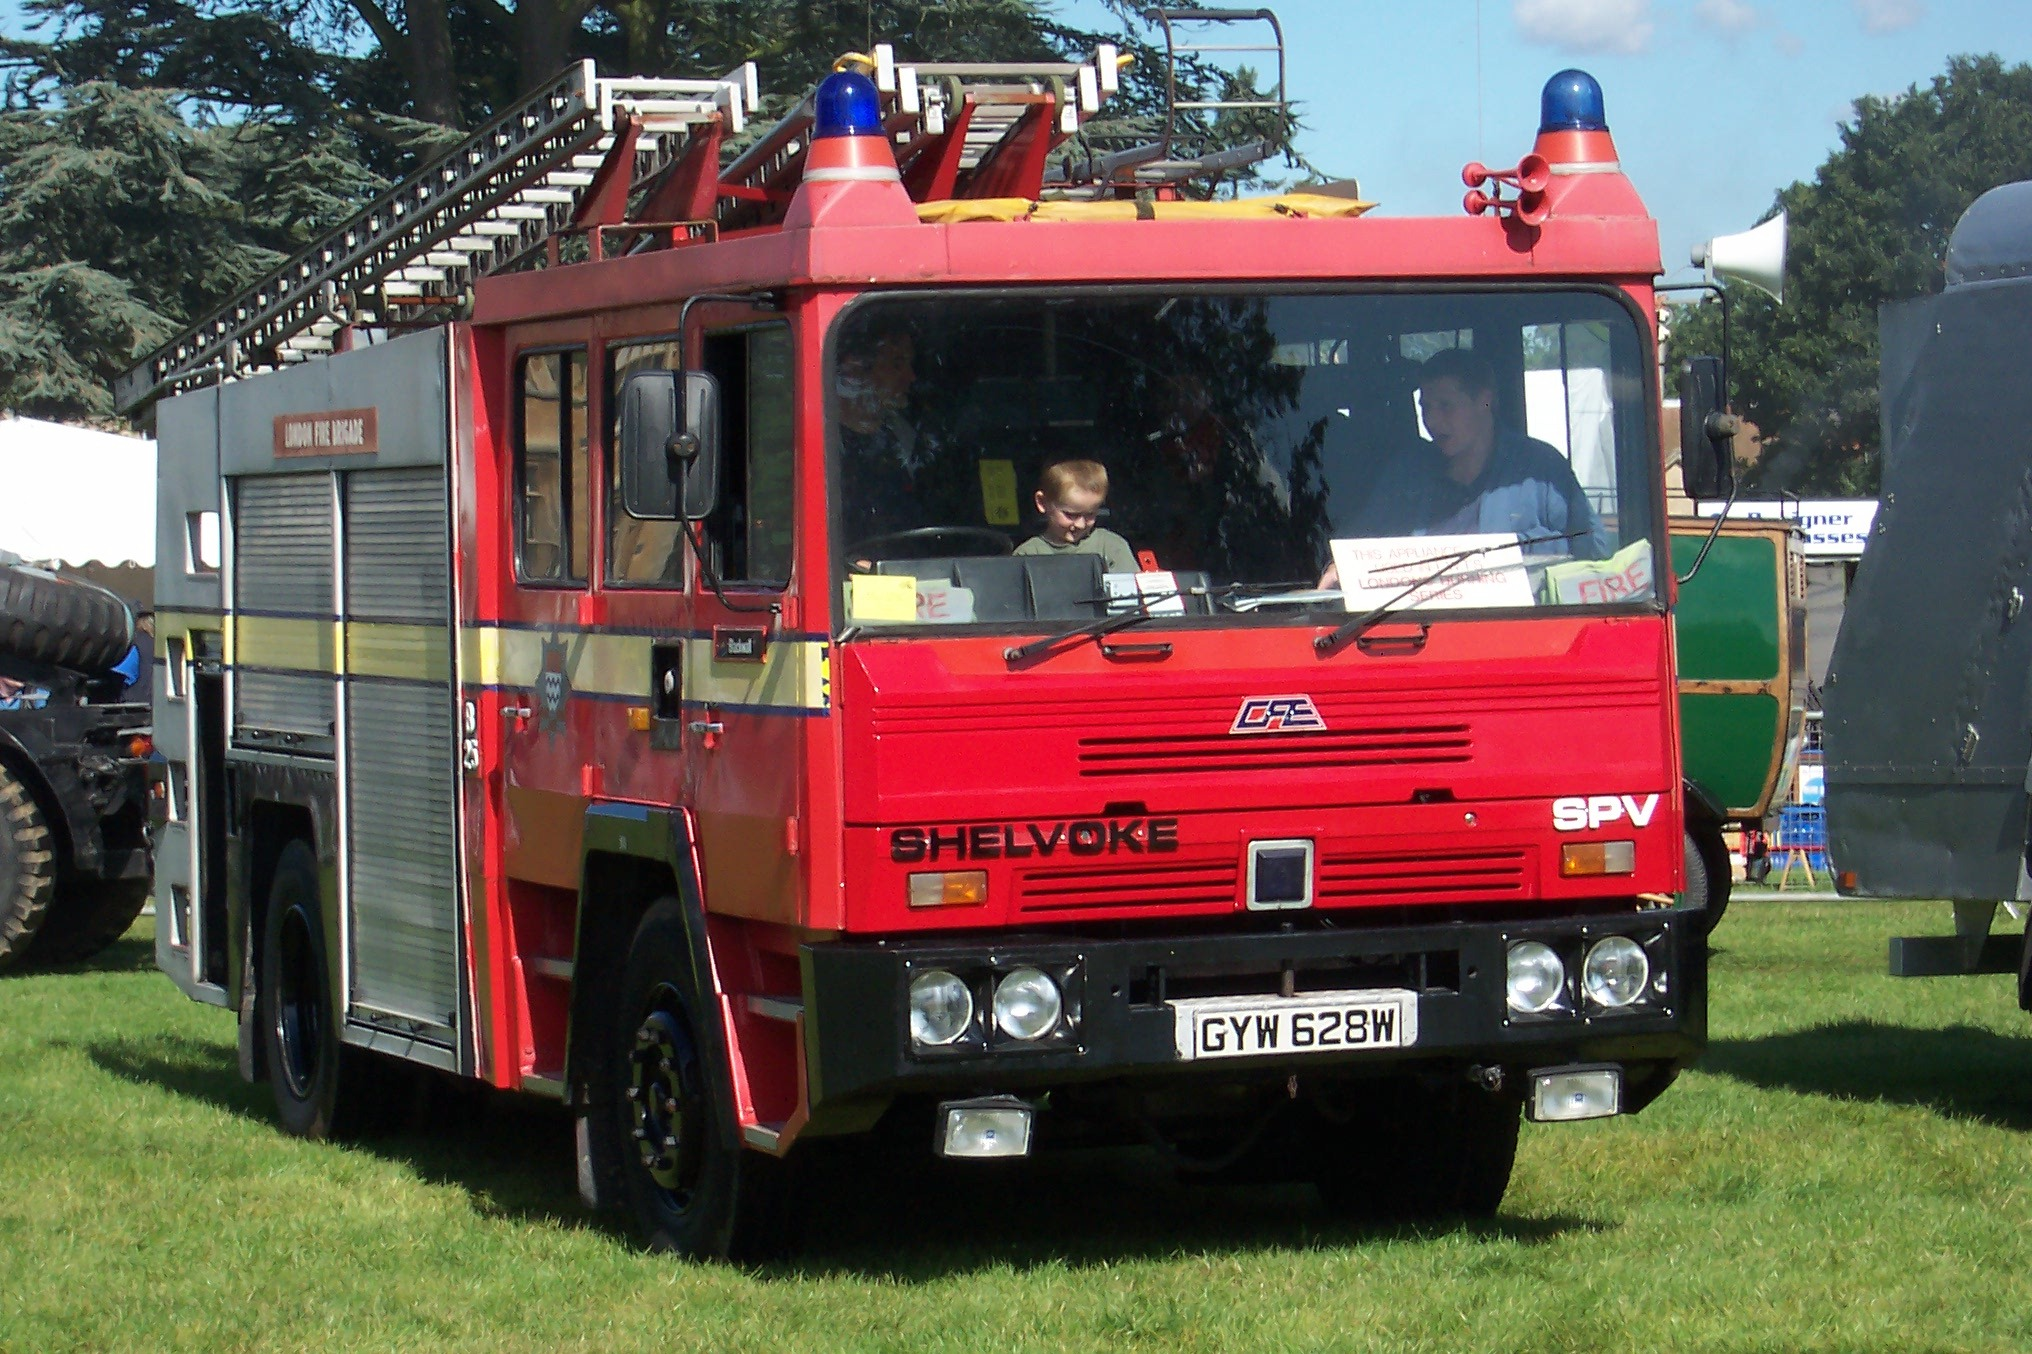 Shelvoke e Drewry truck muletti GYW_628_W_SD_SPV_Pump_Ladder